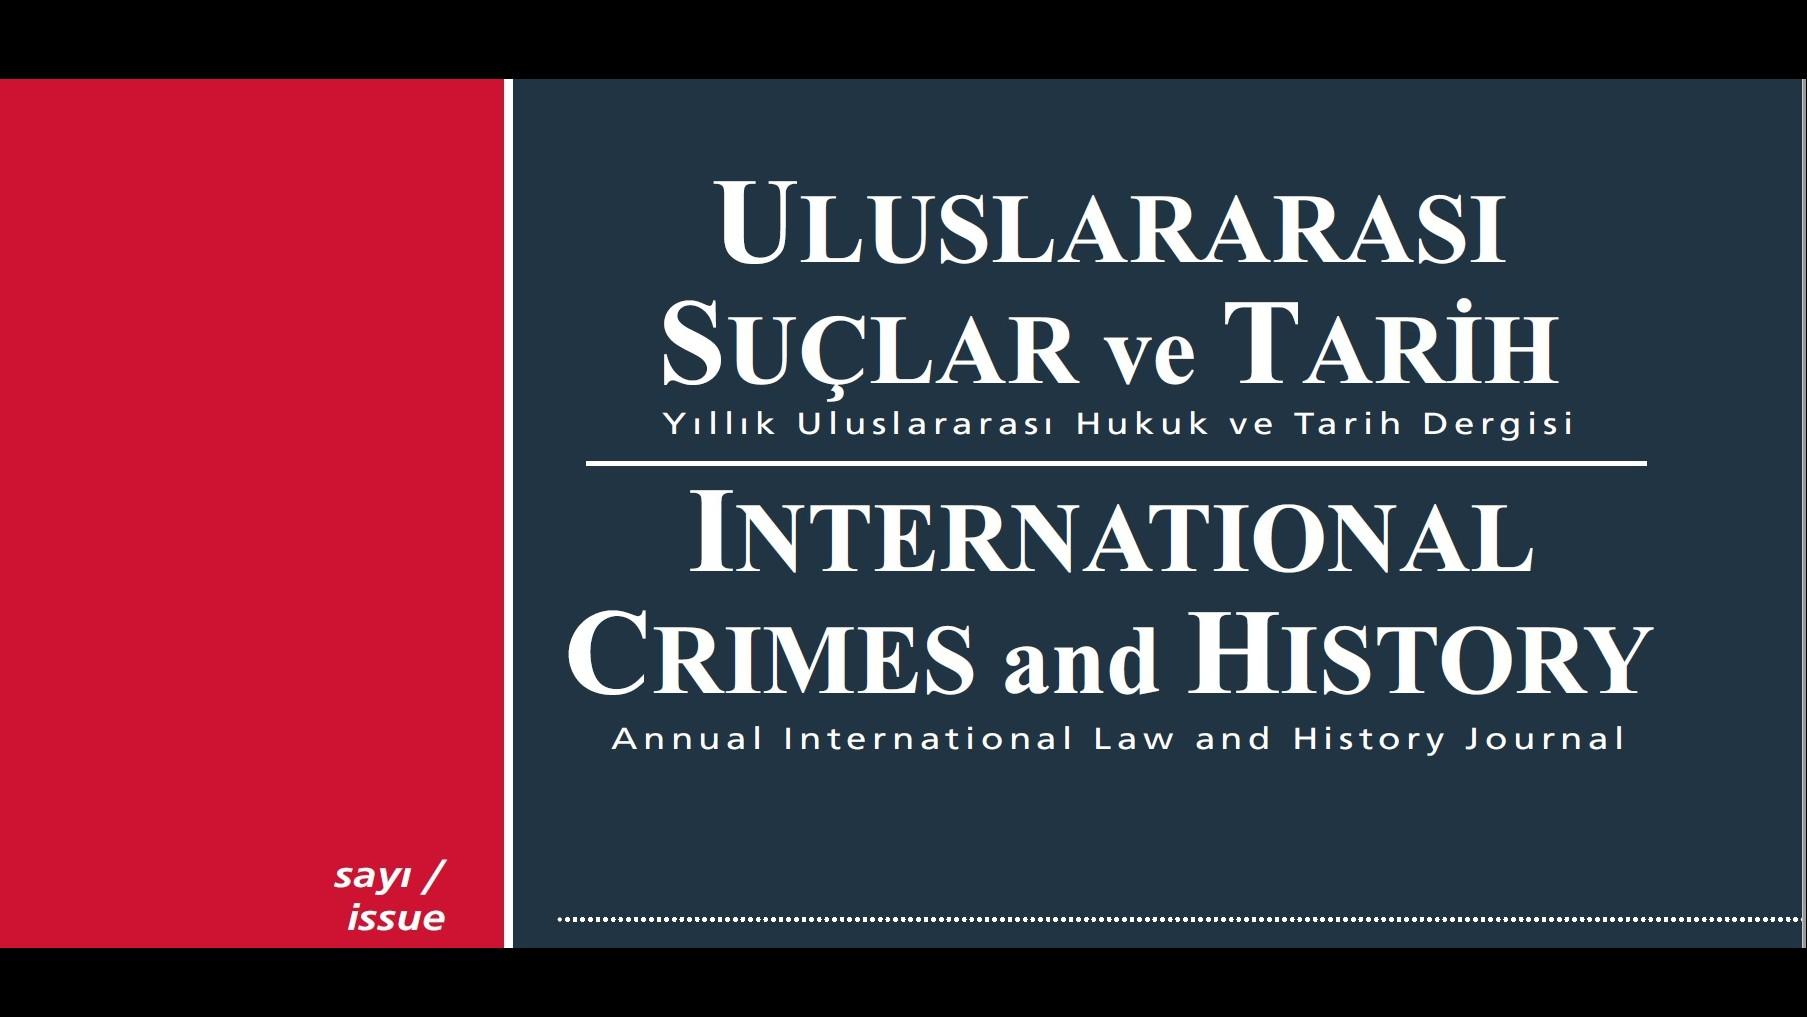 CALL for PAPERS: ULUSLARARASI SUÇLAR VE TARİH / INTERNATIONAL CRIMES AND HISTORY